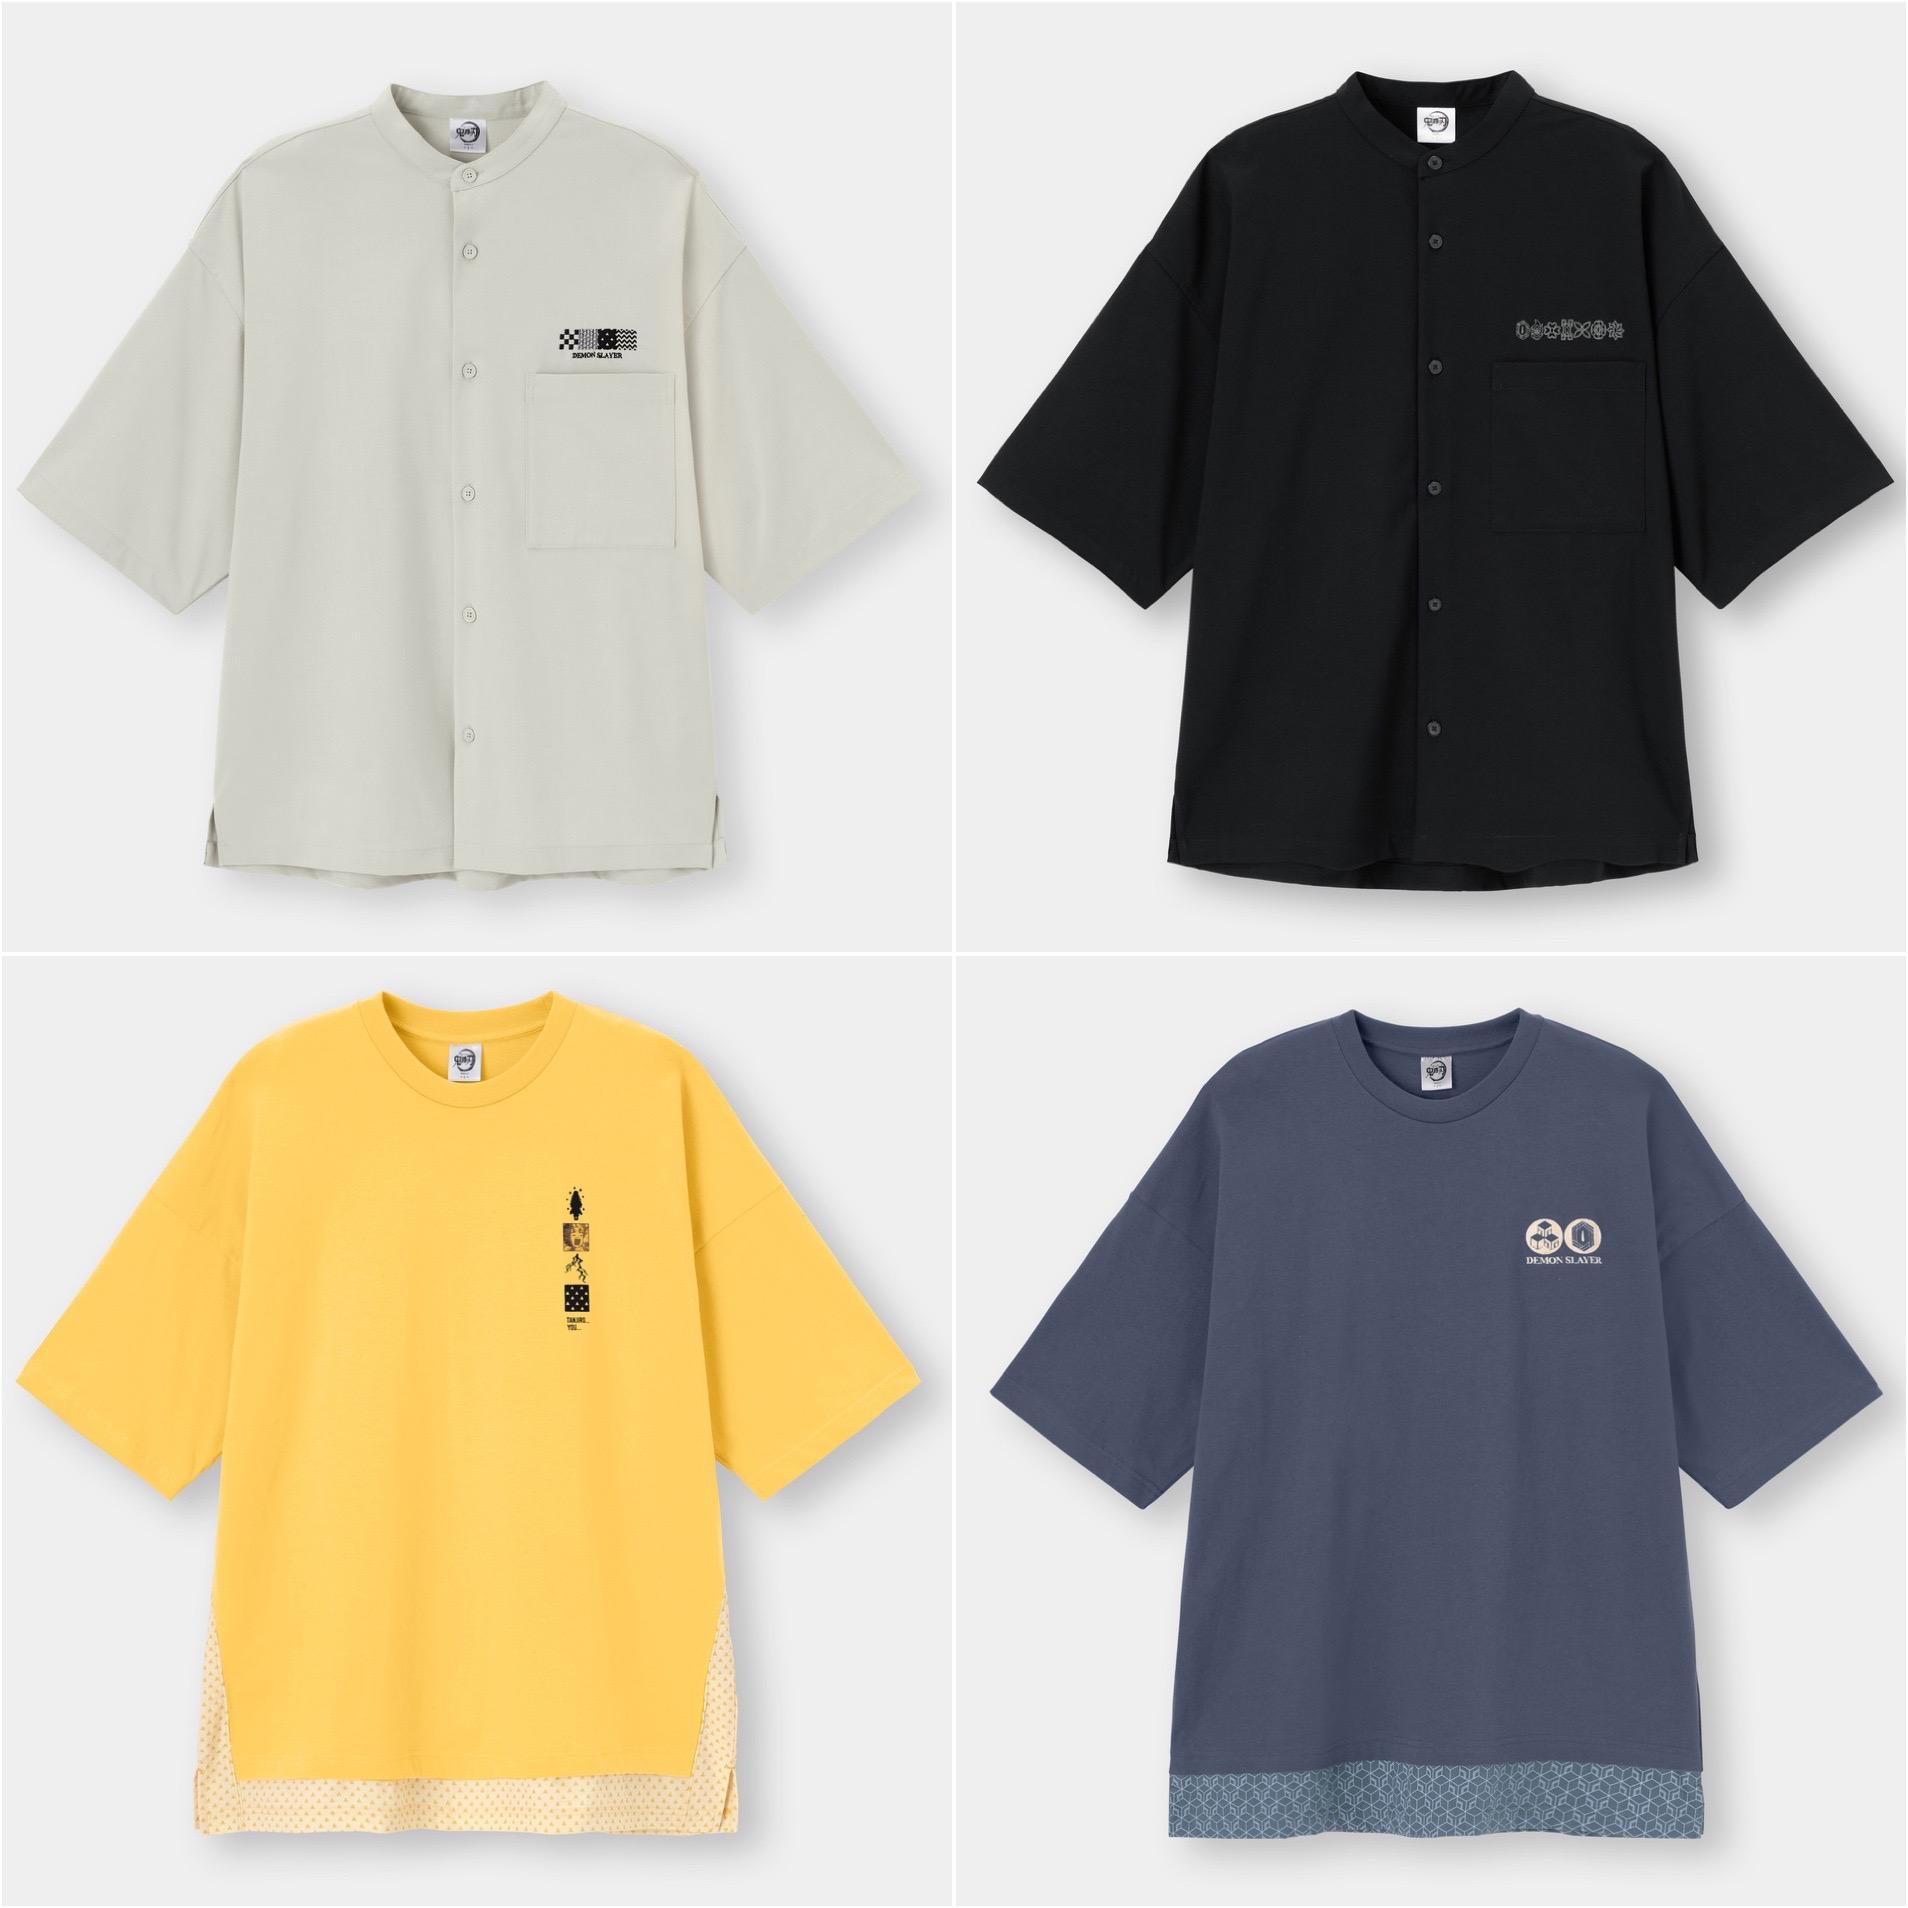 GU×鬼滅の刃メンズのオーバーサイズシャツとルーズフィットT